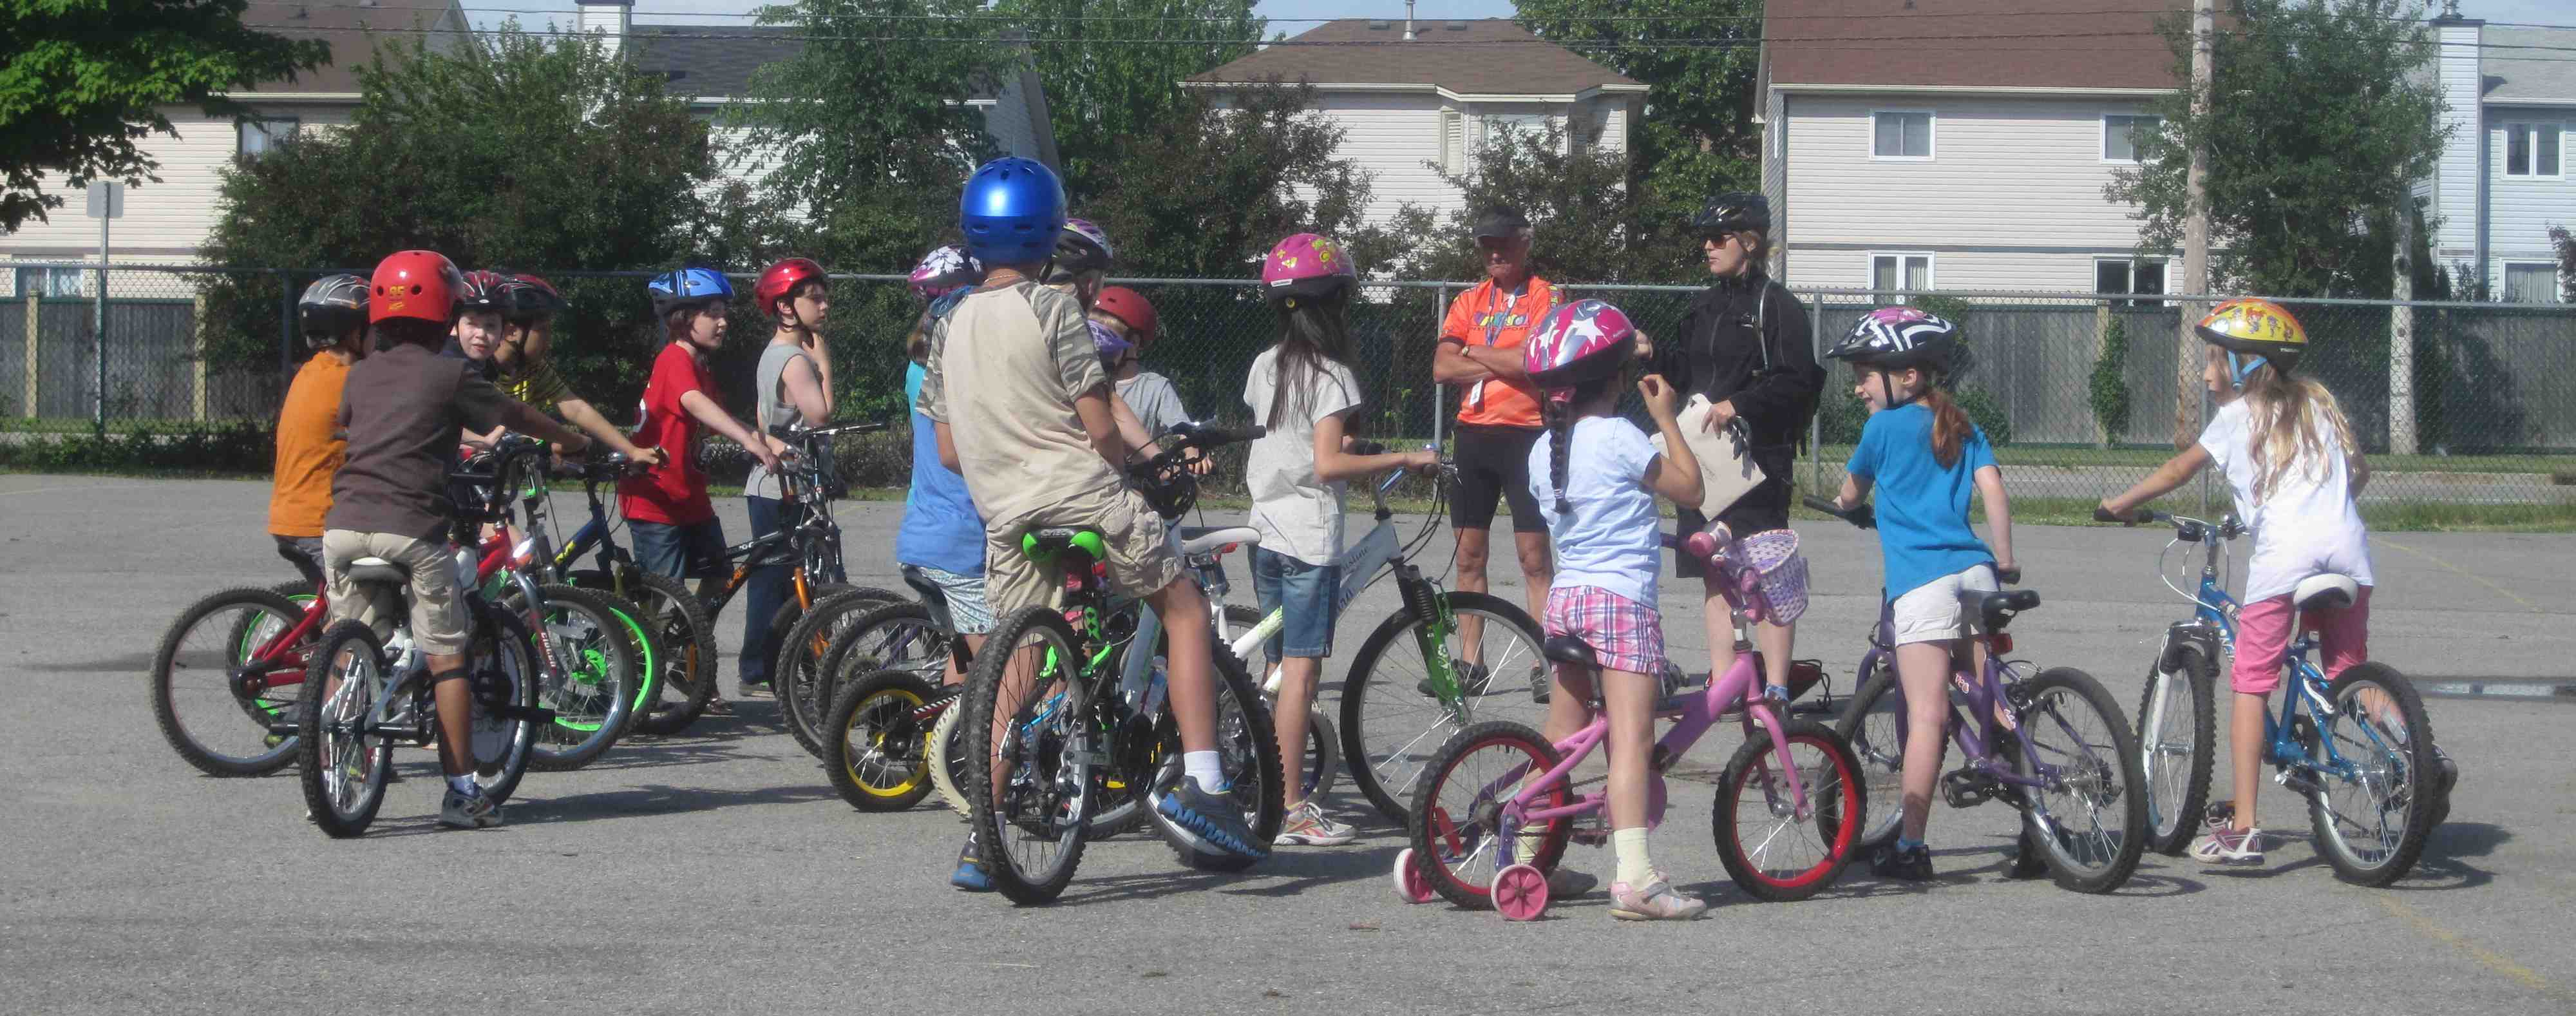 2012 06 09 Urban Commuter Ottawa – Hans Moor 2